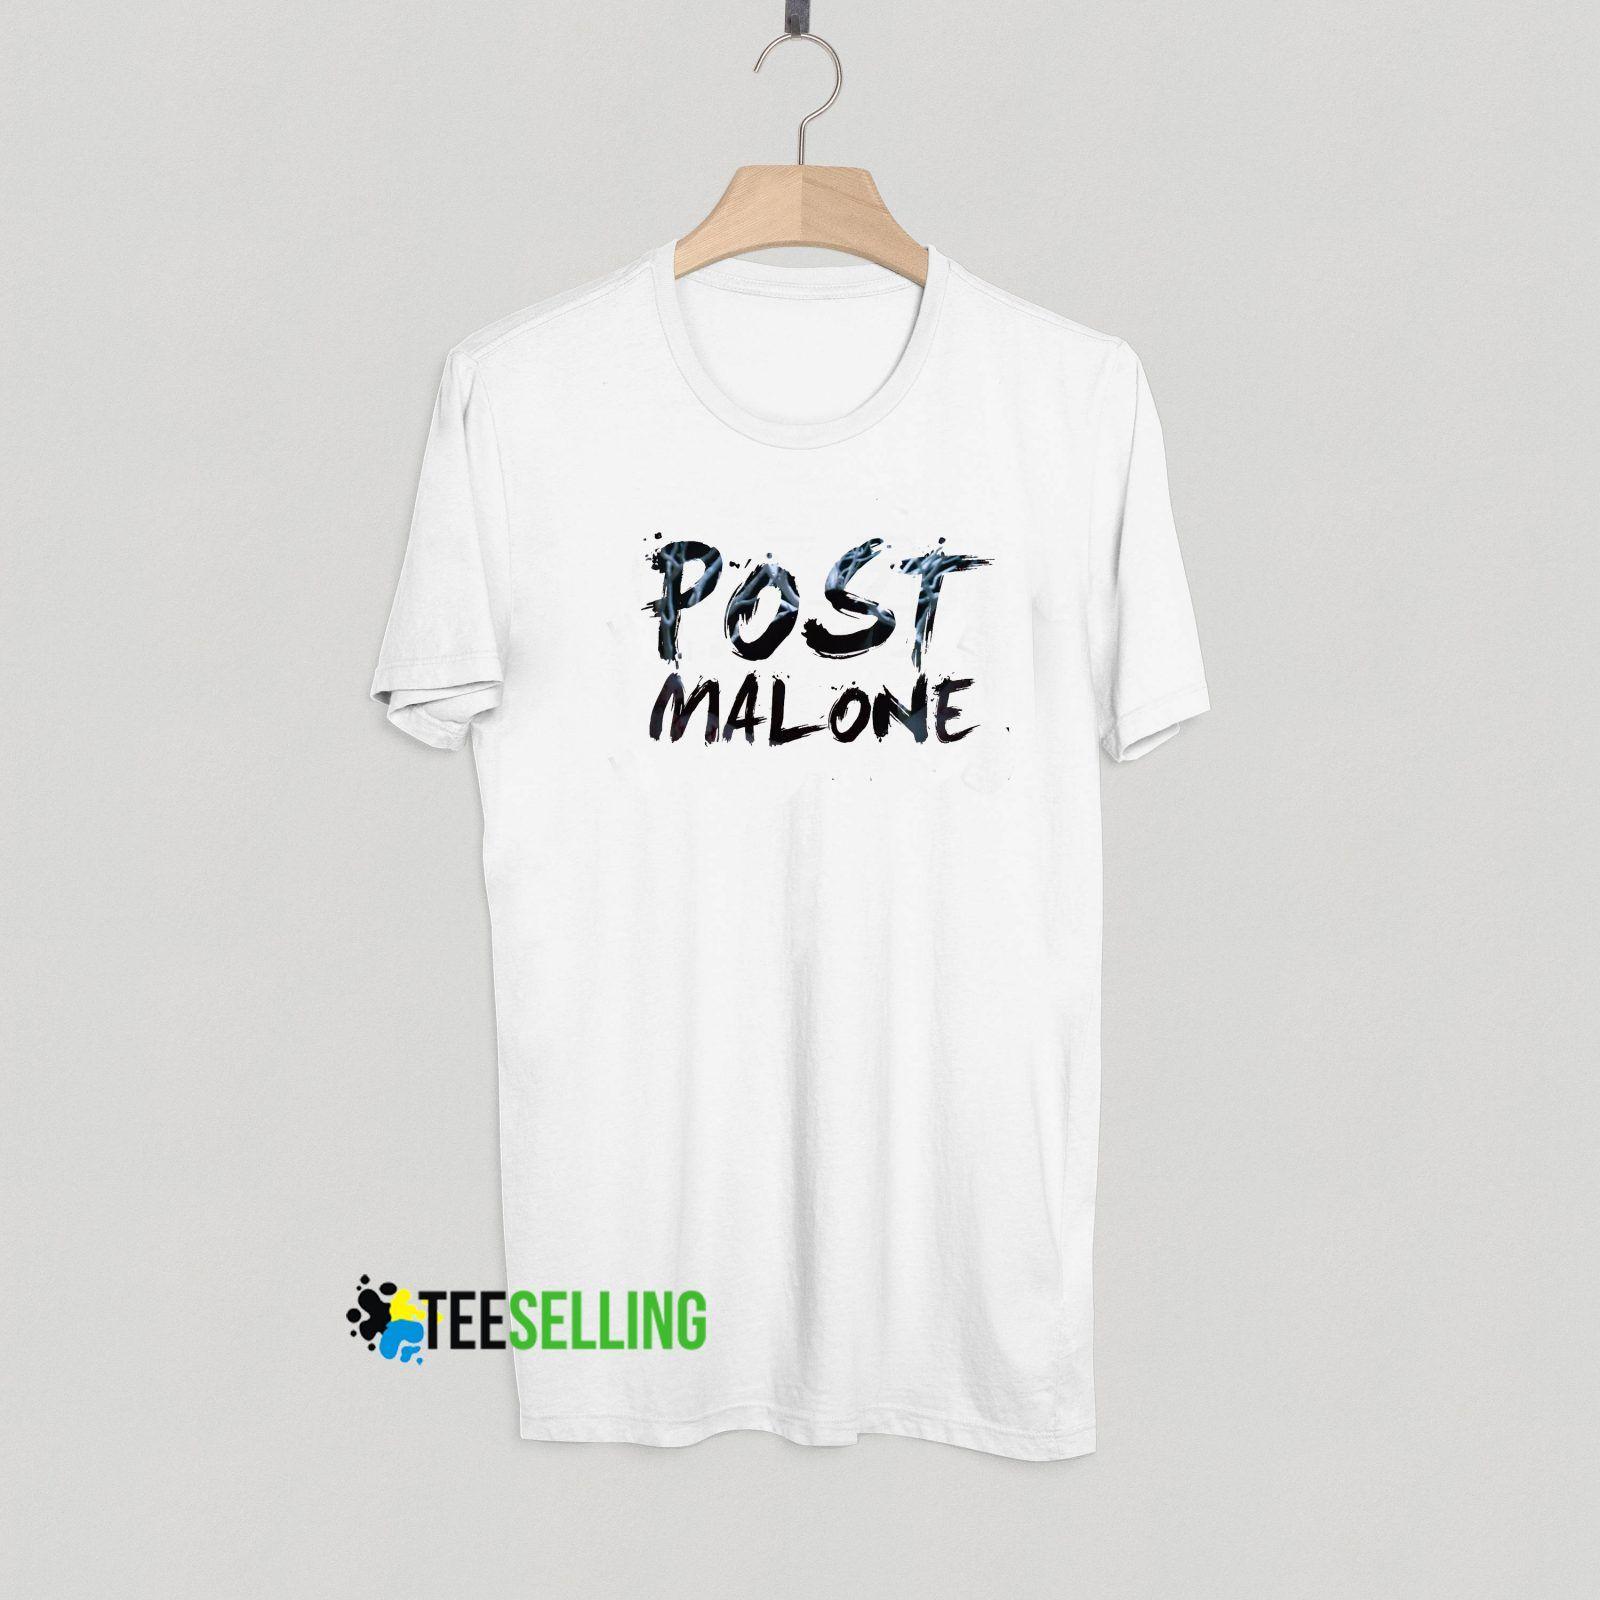 Post Malone Cute: Post Malone T Shirt Adult Unisex Size S To 3XL